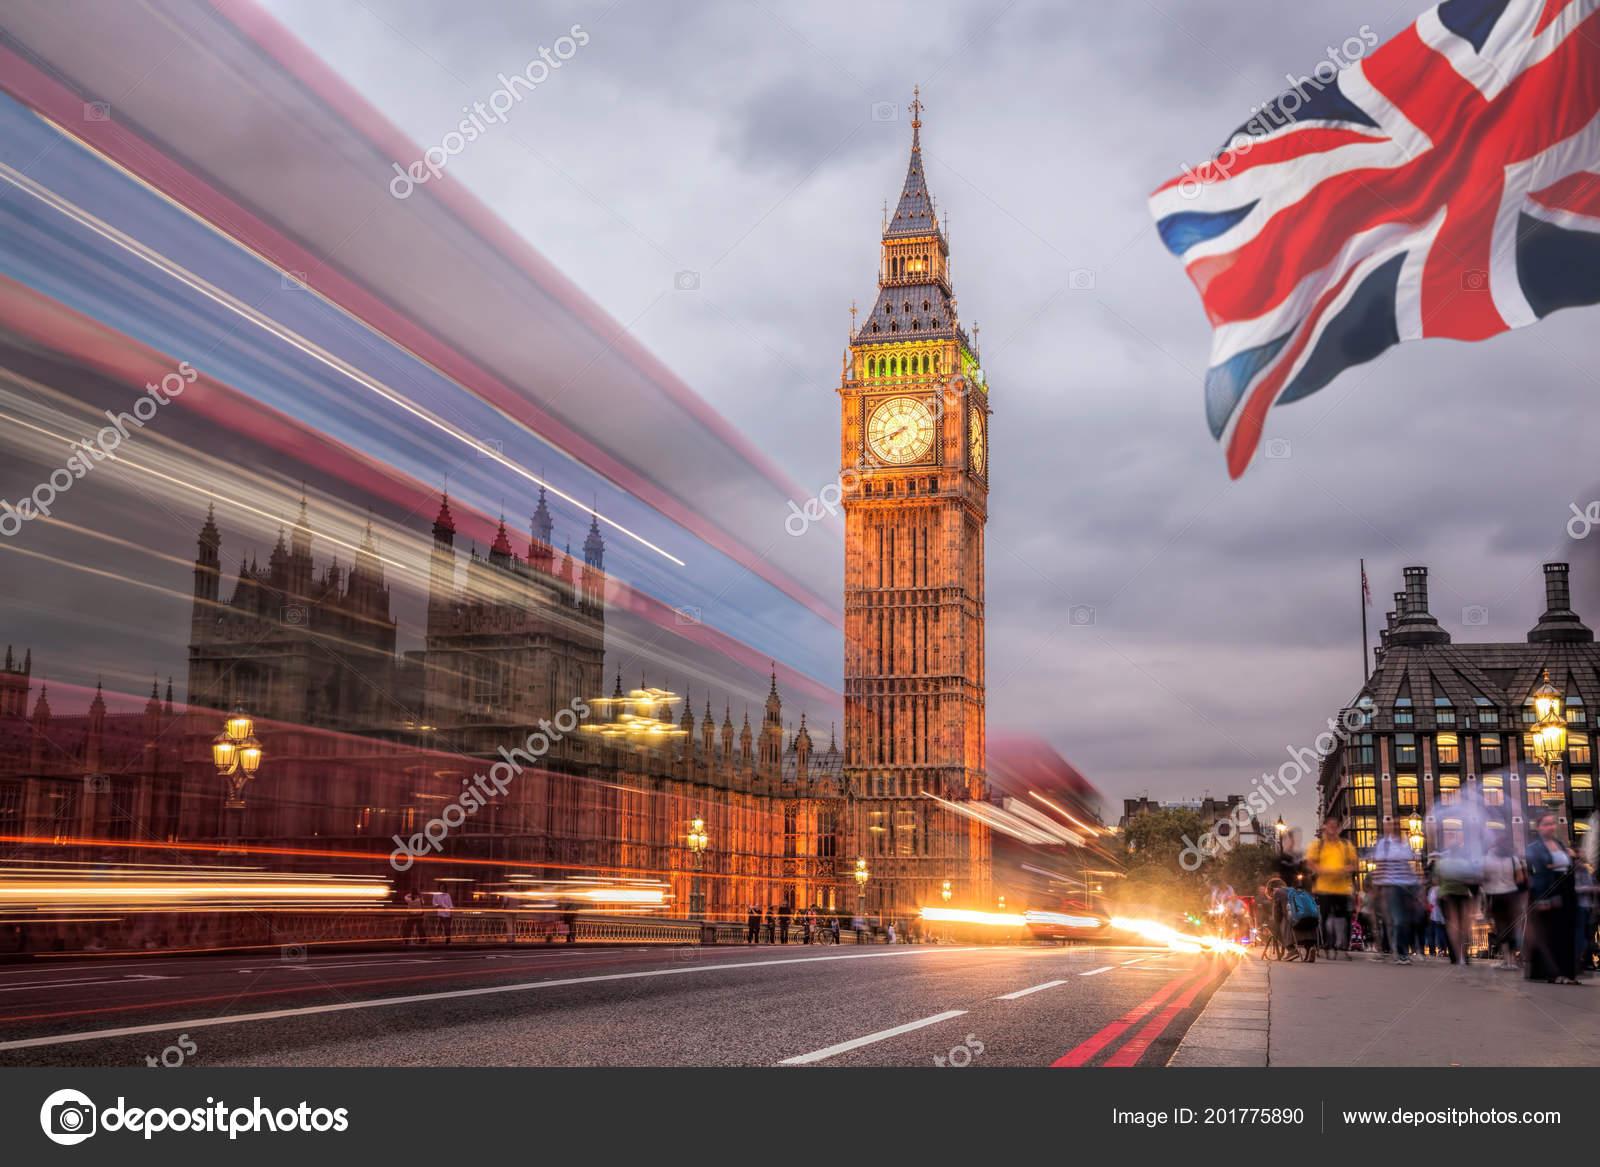 Big Ben House Parliament Night London Stock Photo C Samot 201775890